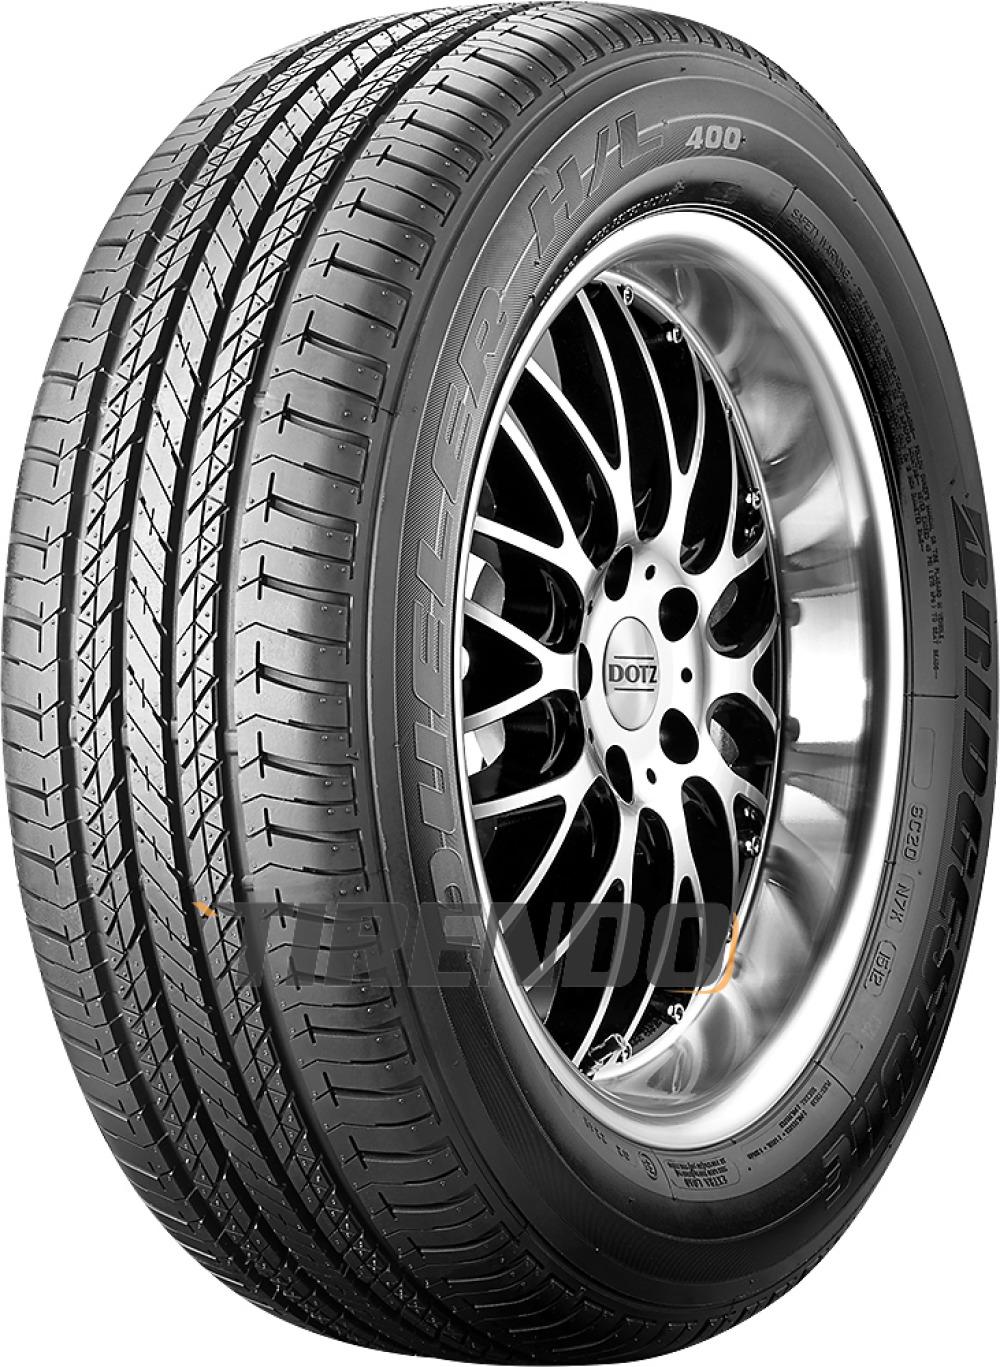 Bridgestone Dueler H/L 400 RFT ( 255/50 R19 107H XL *, runflat )